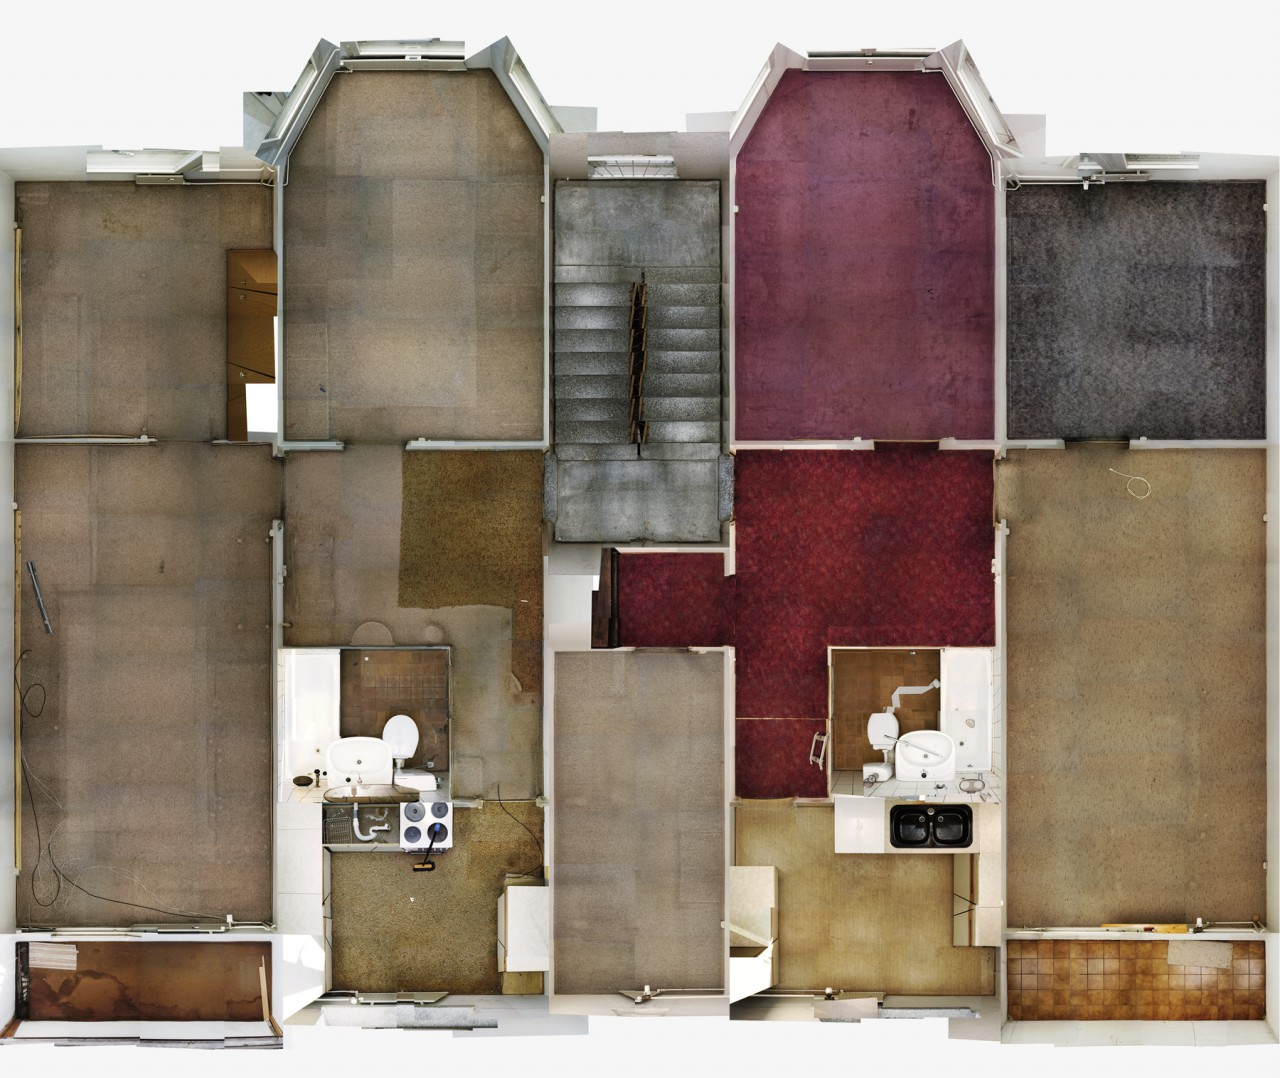 Supervisions - Ohne Titel (Plattenbau 1) | Berlin 2004 | Lightjet print | 110 x 131 cm